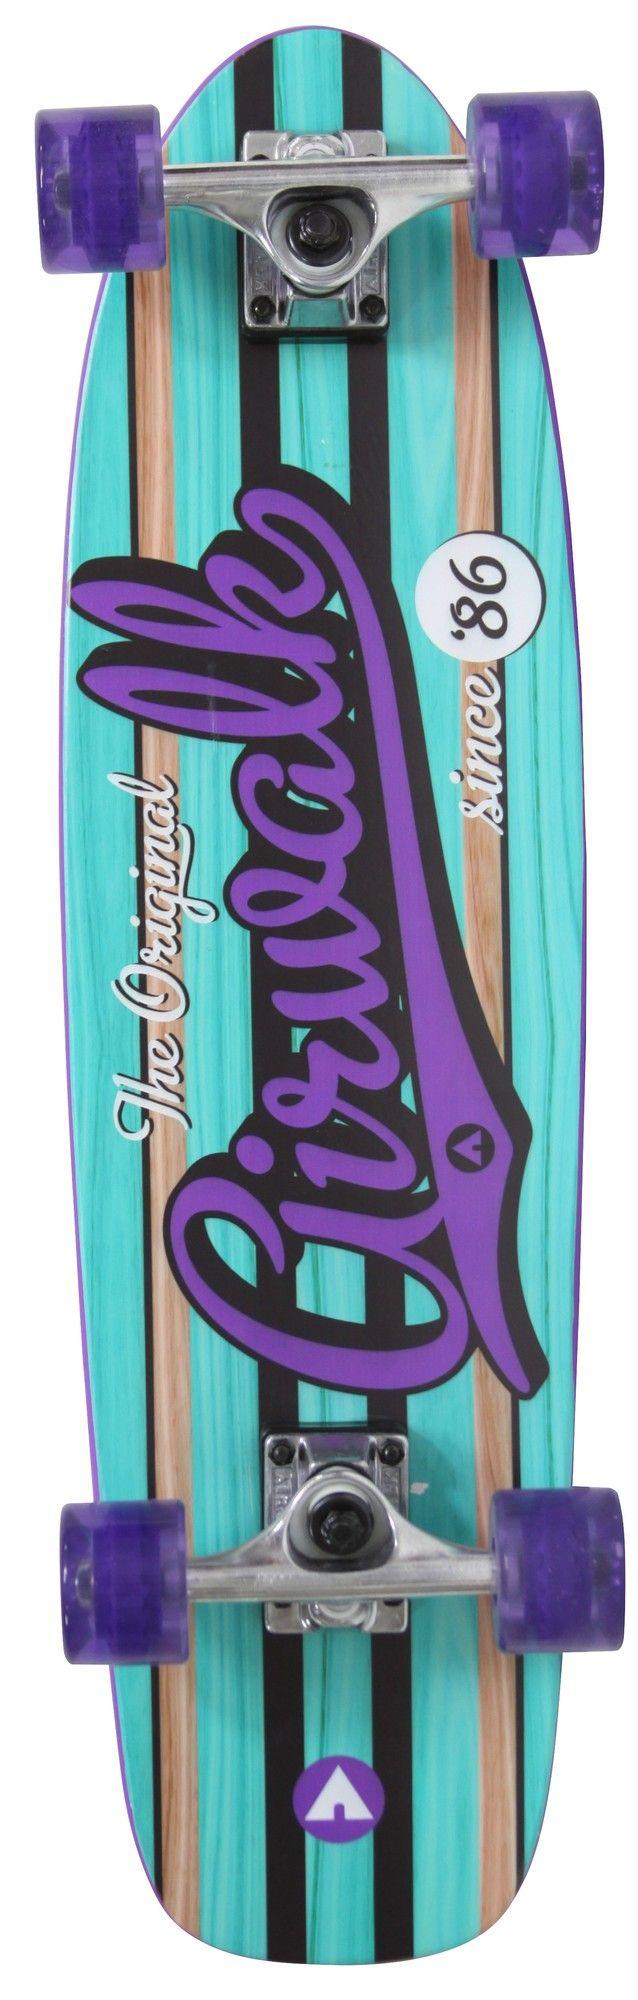 "Ez Series 28.5"" Cruiser Skateboard"